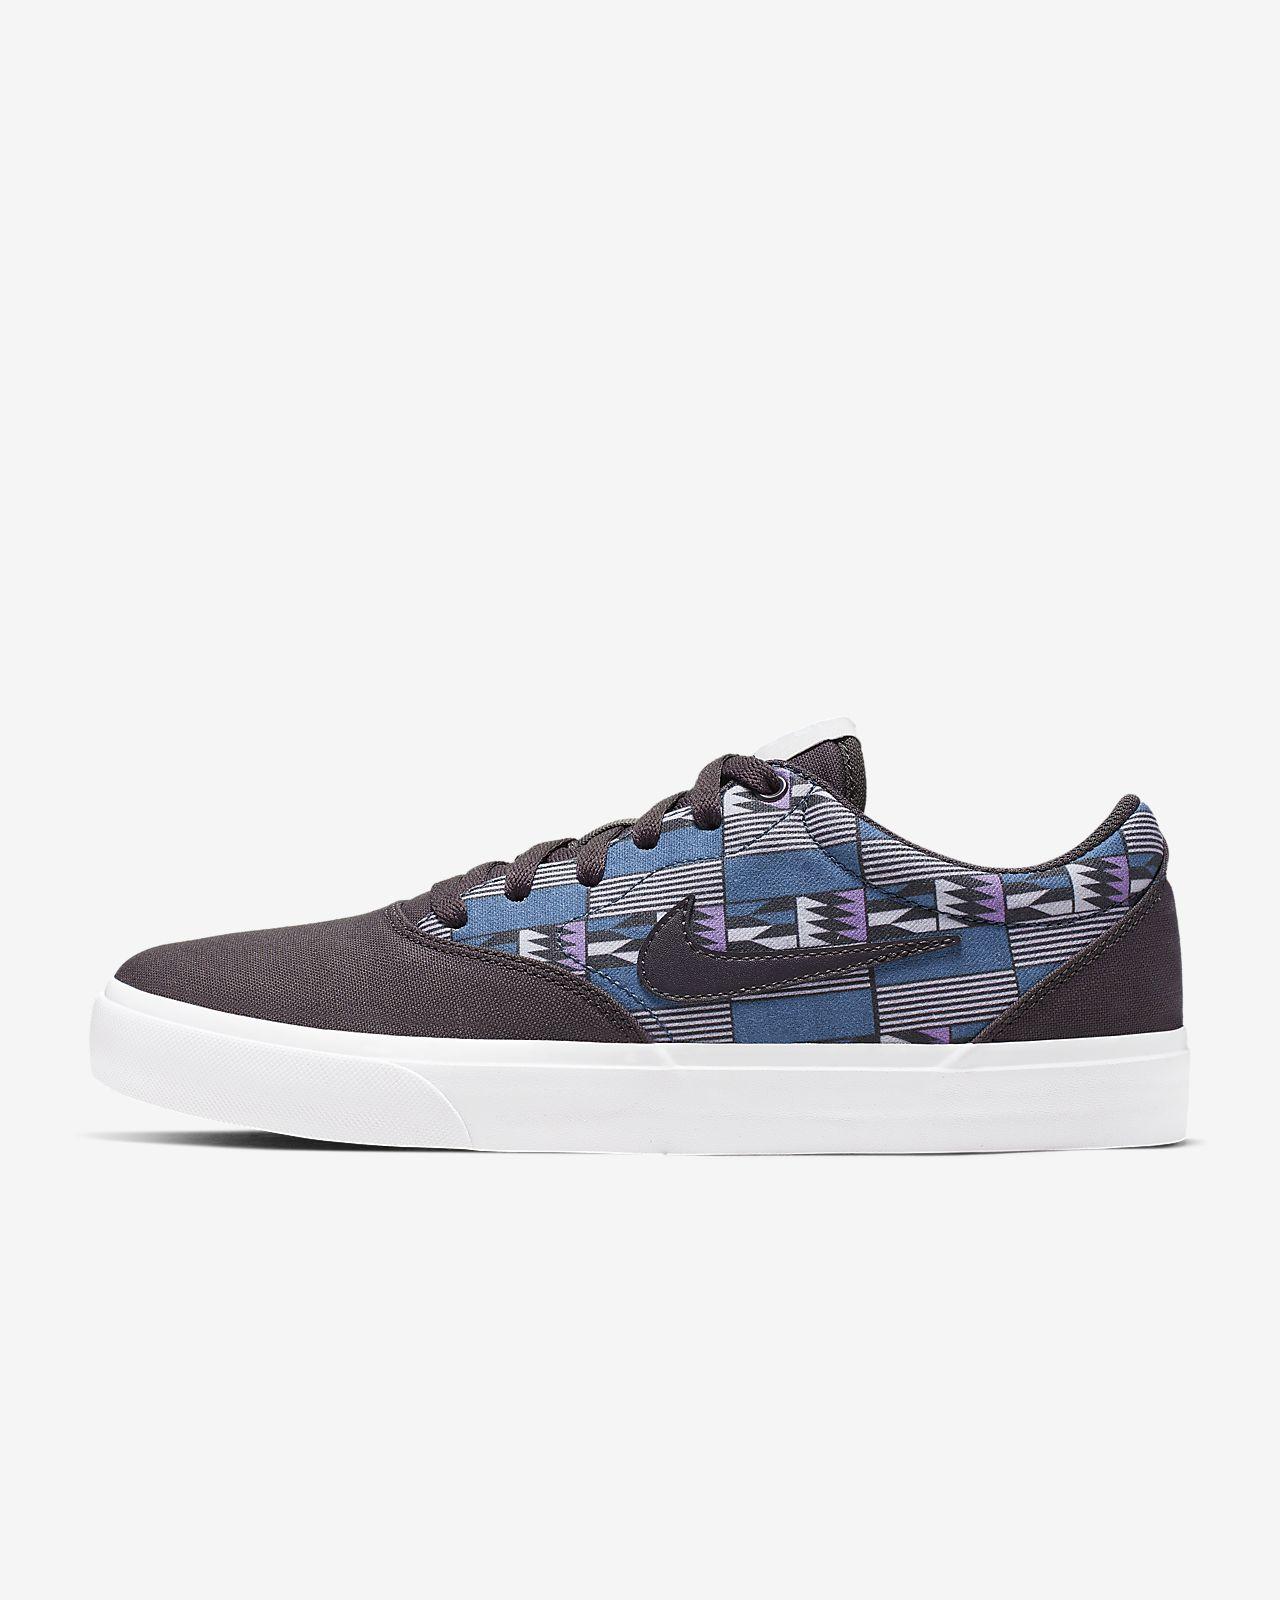 Nike SB Charge Premium Sabatilles de skateboard